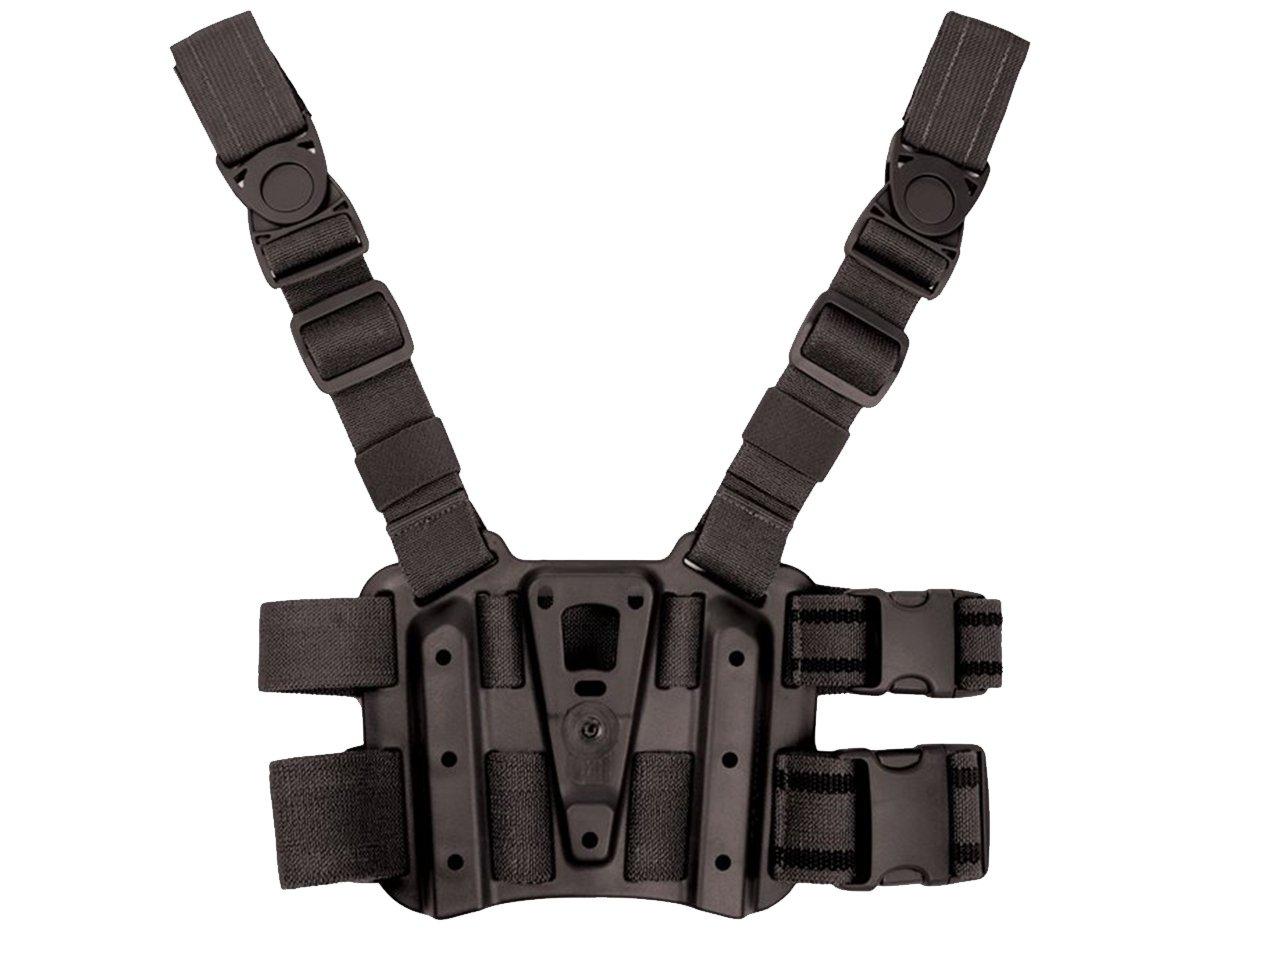 Tactical Dropleg Drop Leg Panel Platform for Holster Magazine Flashlight Pouch Airsoft Black